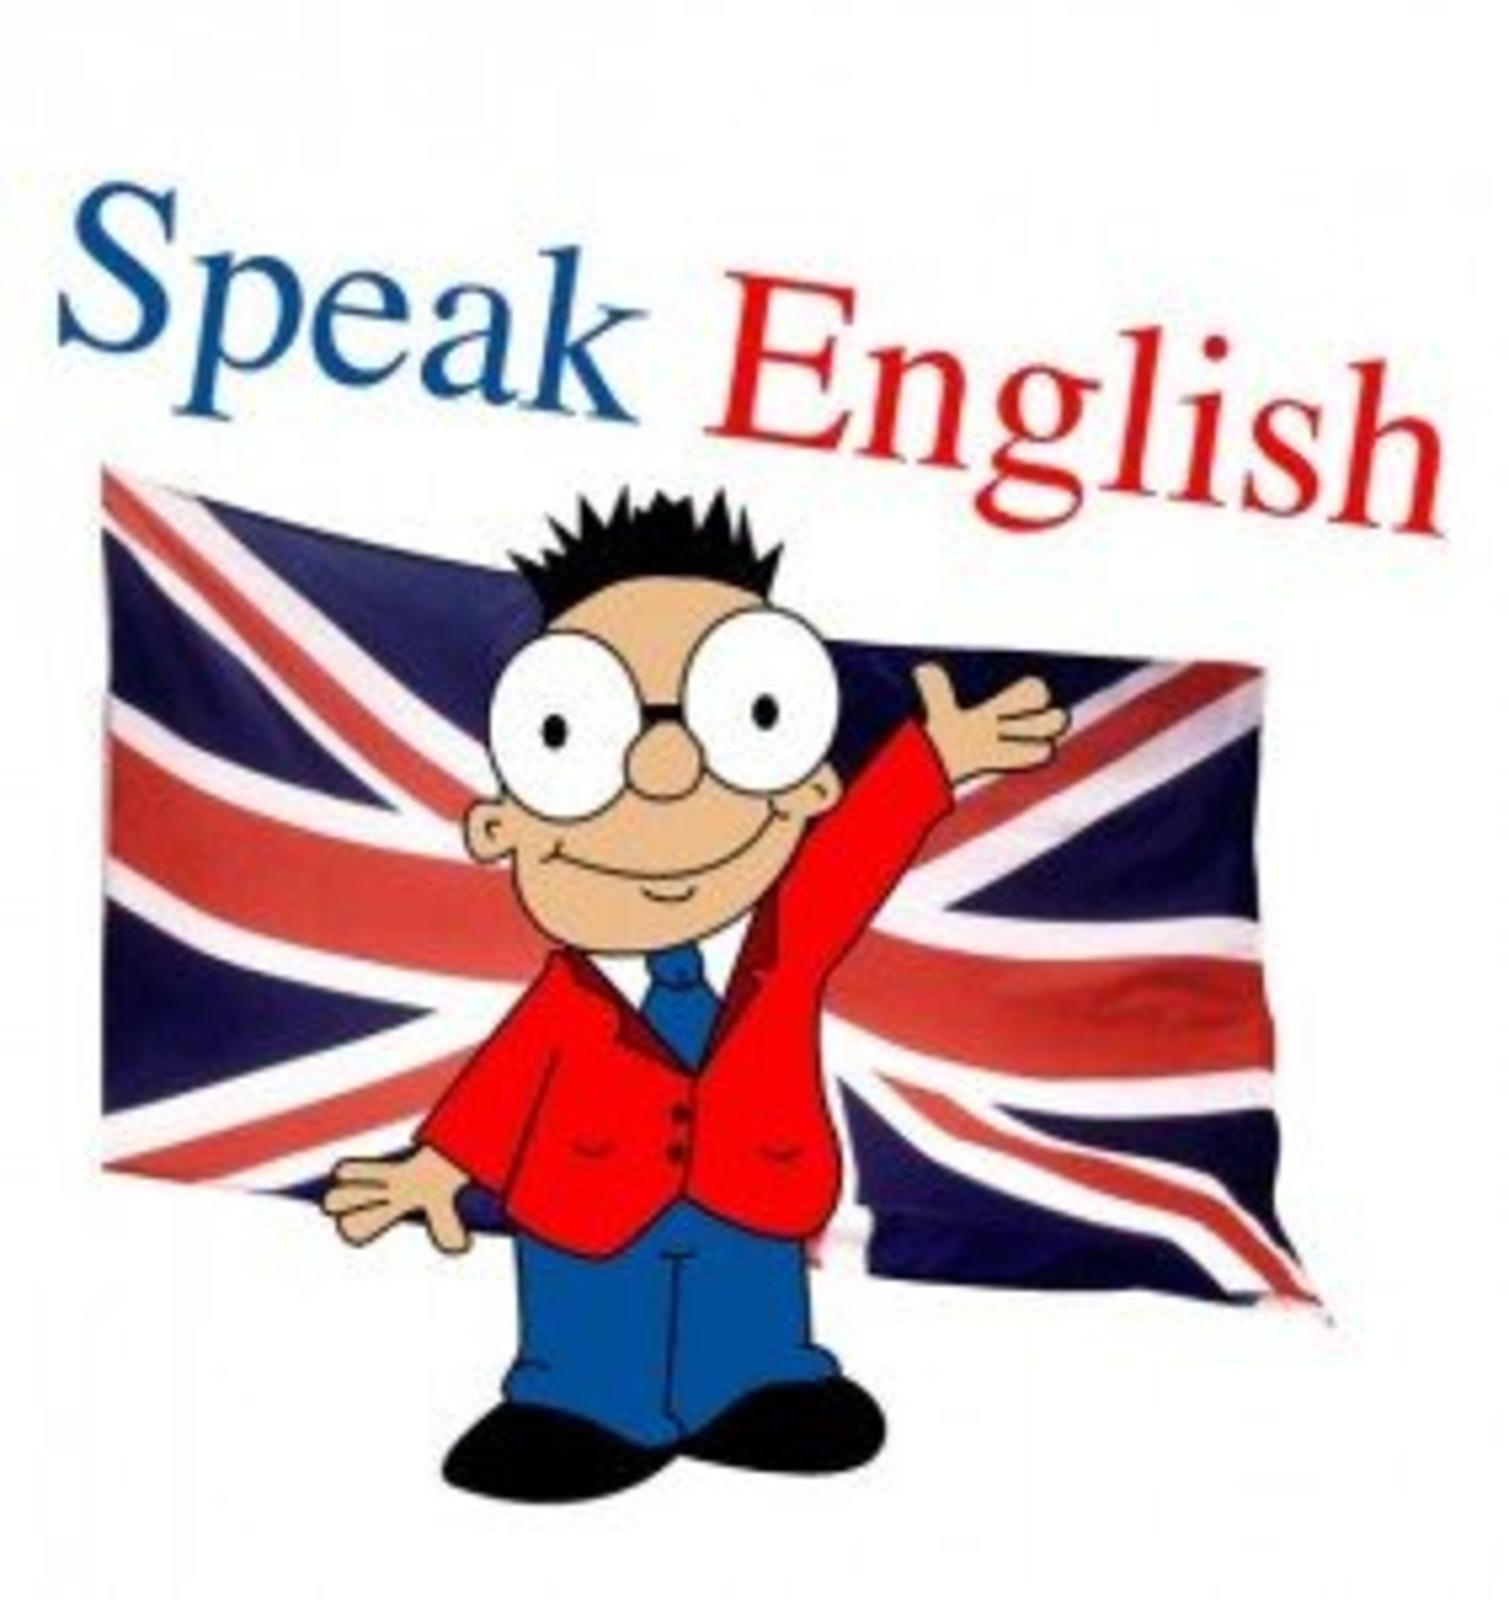 Speak english clipart jpg free stock Speak english clipart 12 » Clipart Station jpg free stock